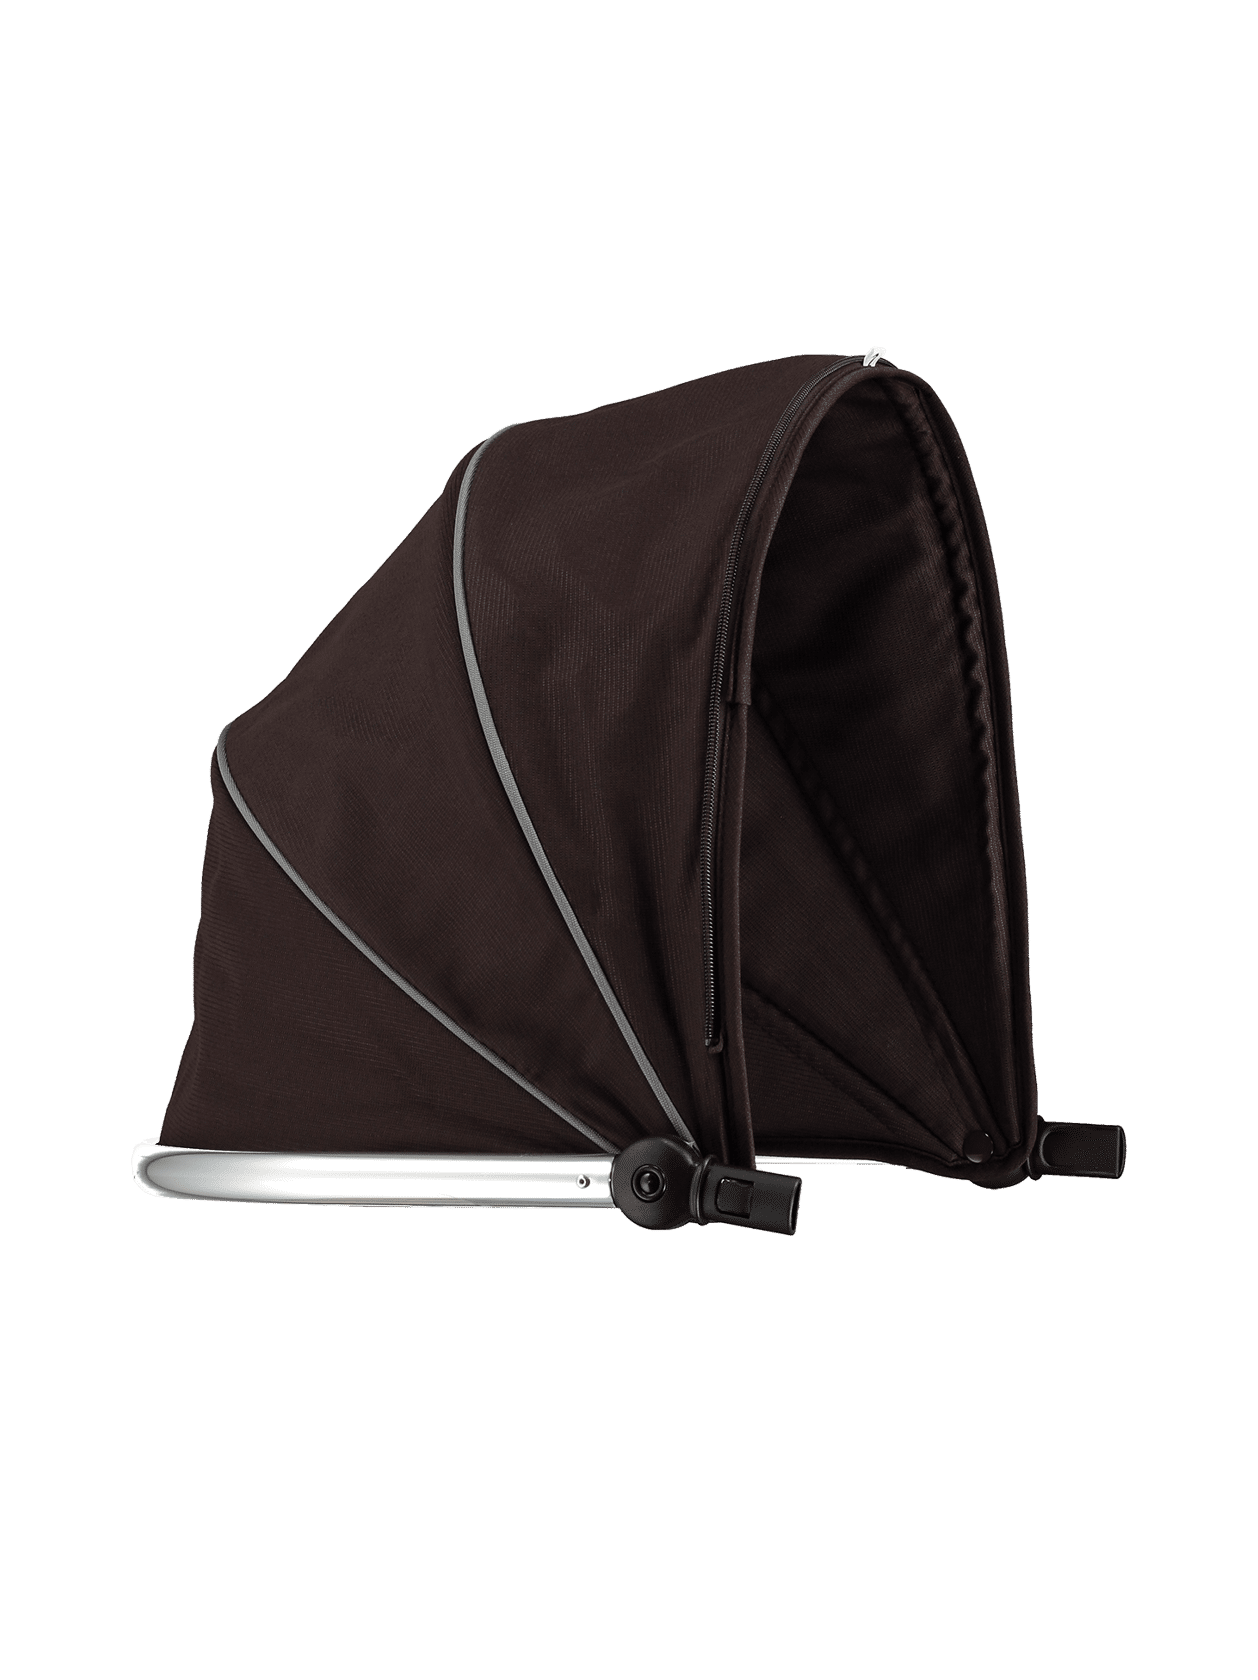 Peach Main Carrycot Hood Black Jack